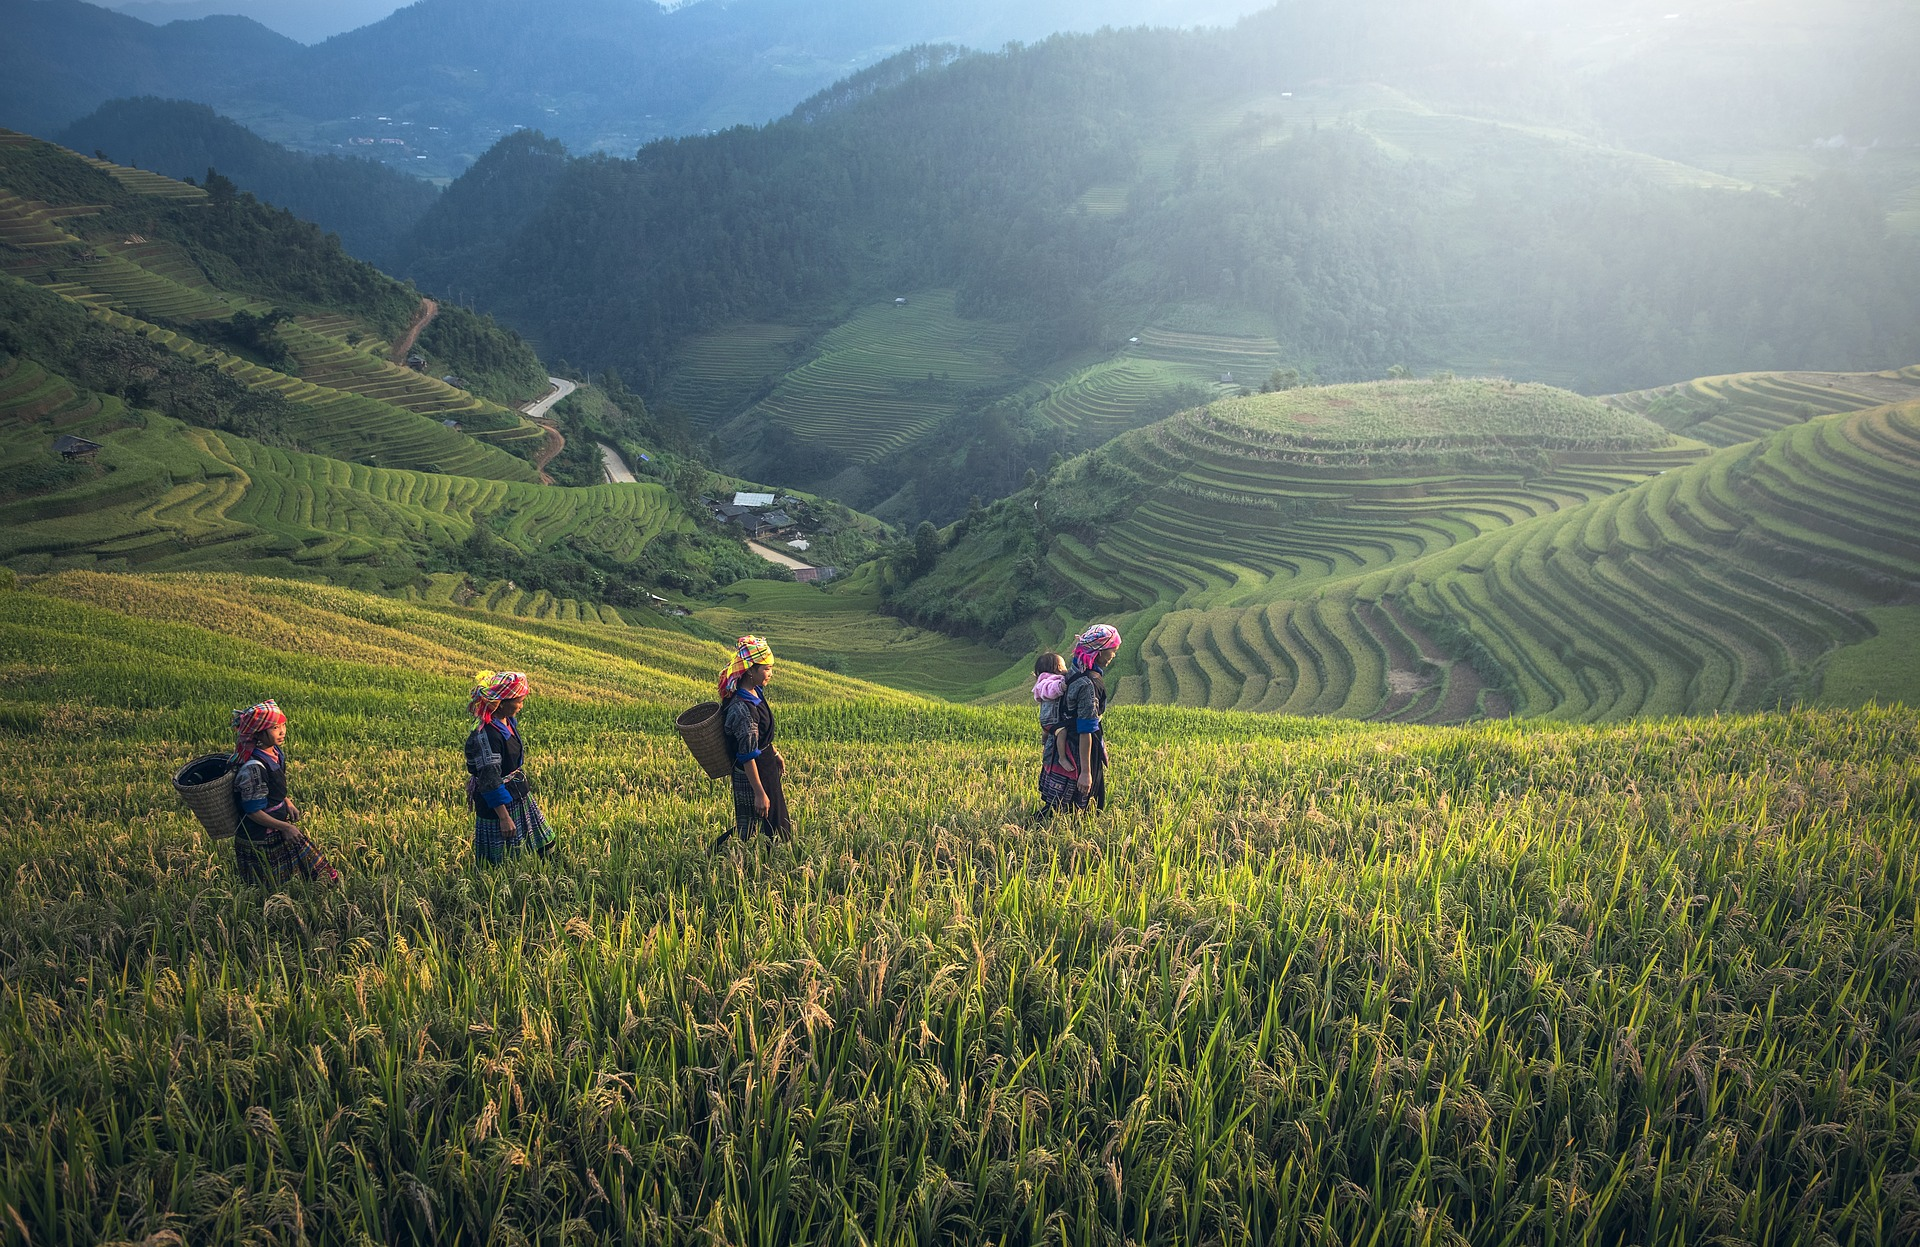 indonesie bali agriculture-1793403_1920